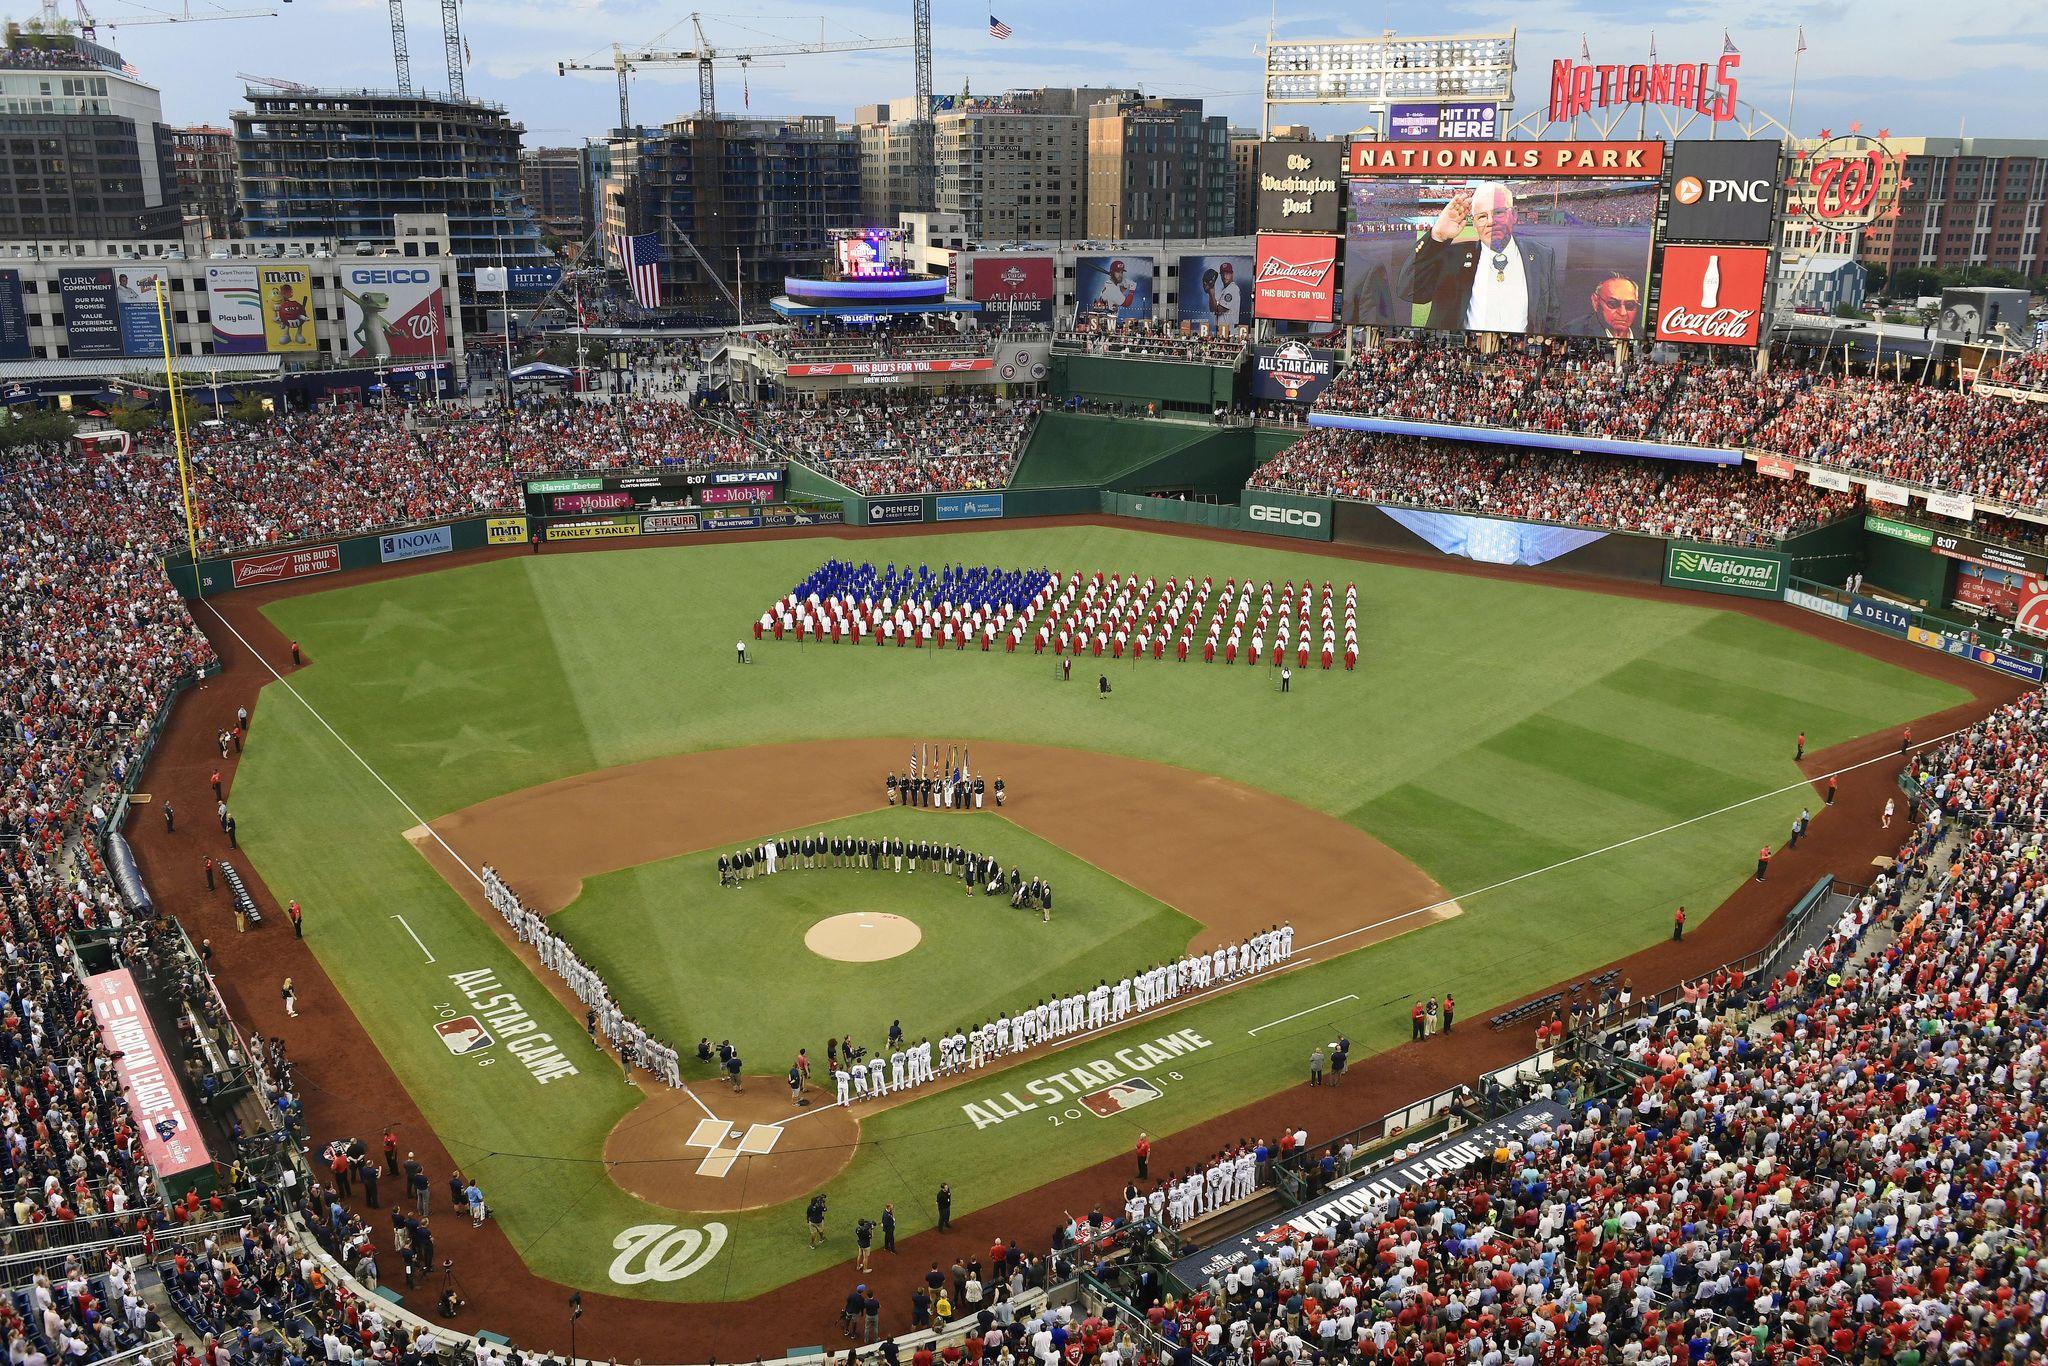 All_star_game_baseball_60018_s2048x1366